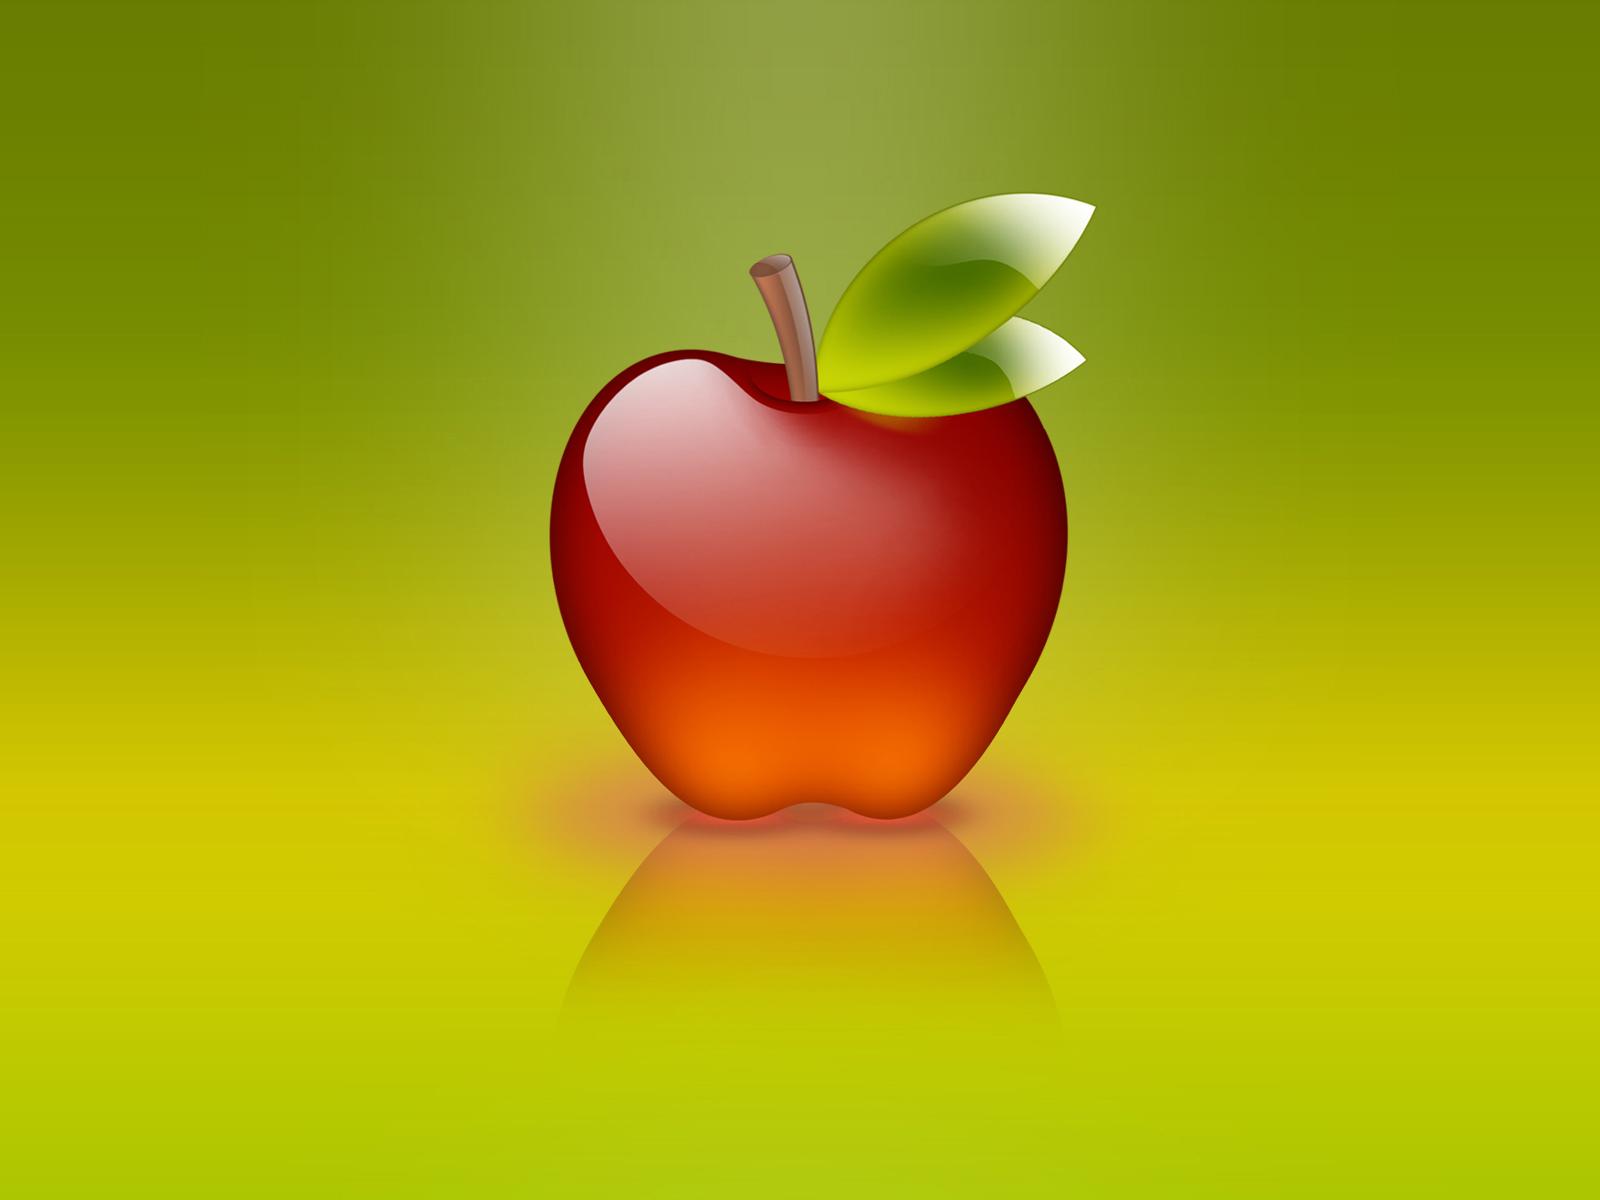 Wallpaper download apple - Glass Apple Wallpapers